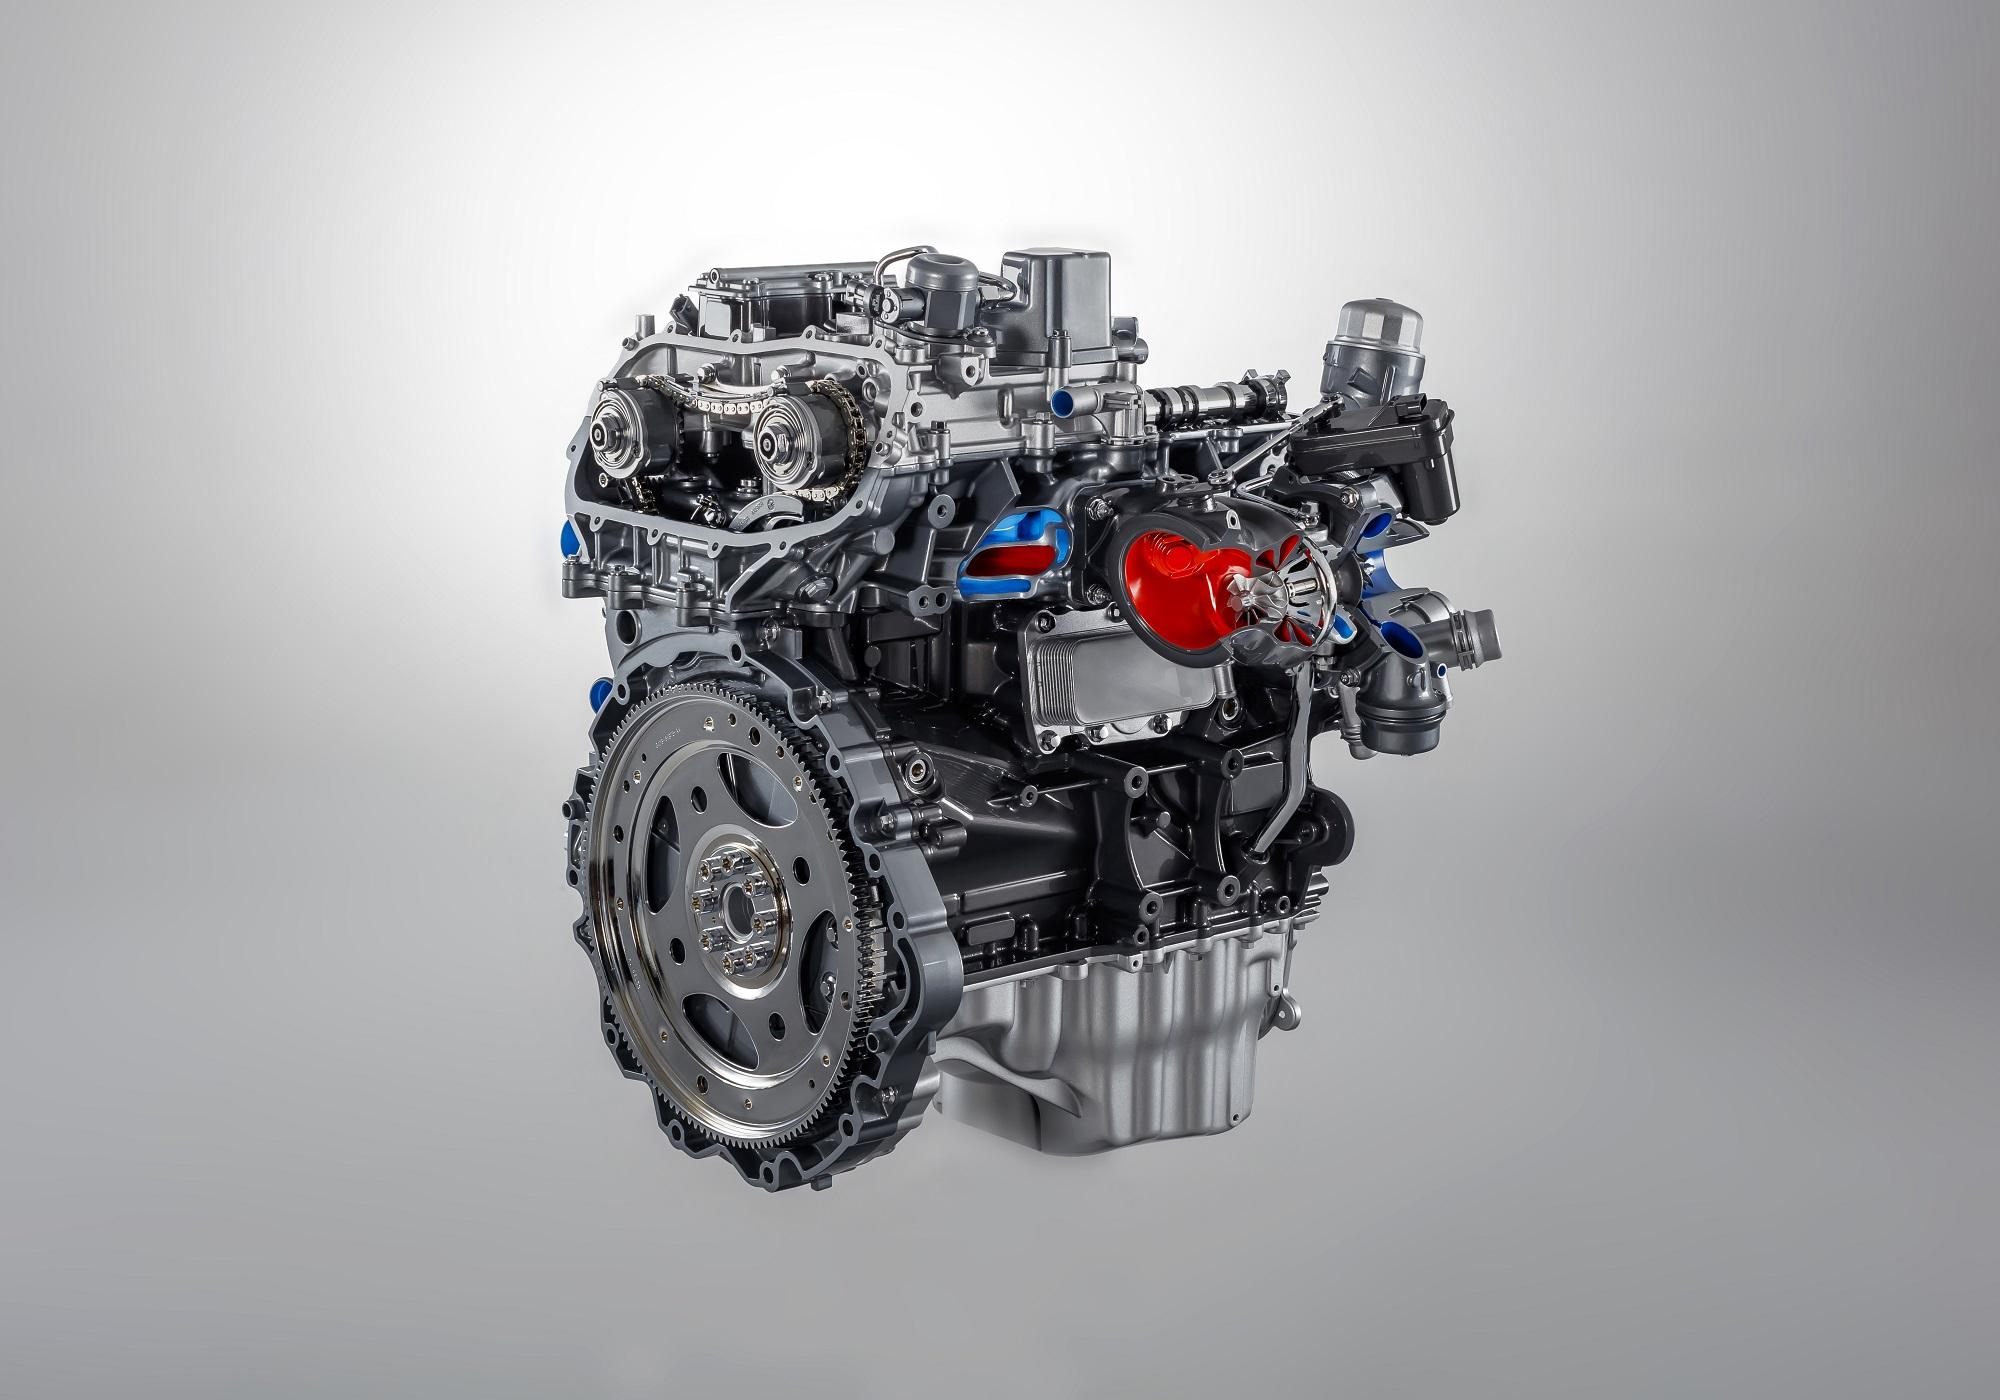 Jaguarforums.com 2018 Jaguar Ingenium 2.0T Four Cylinder